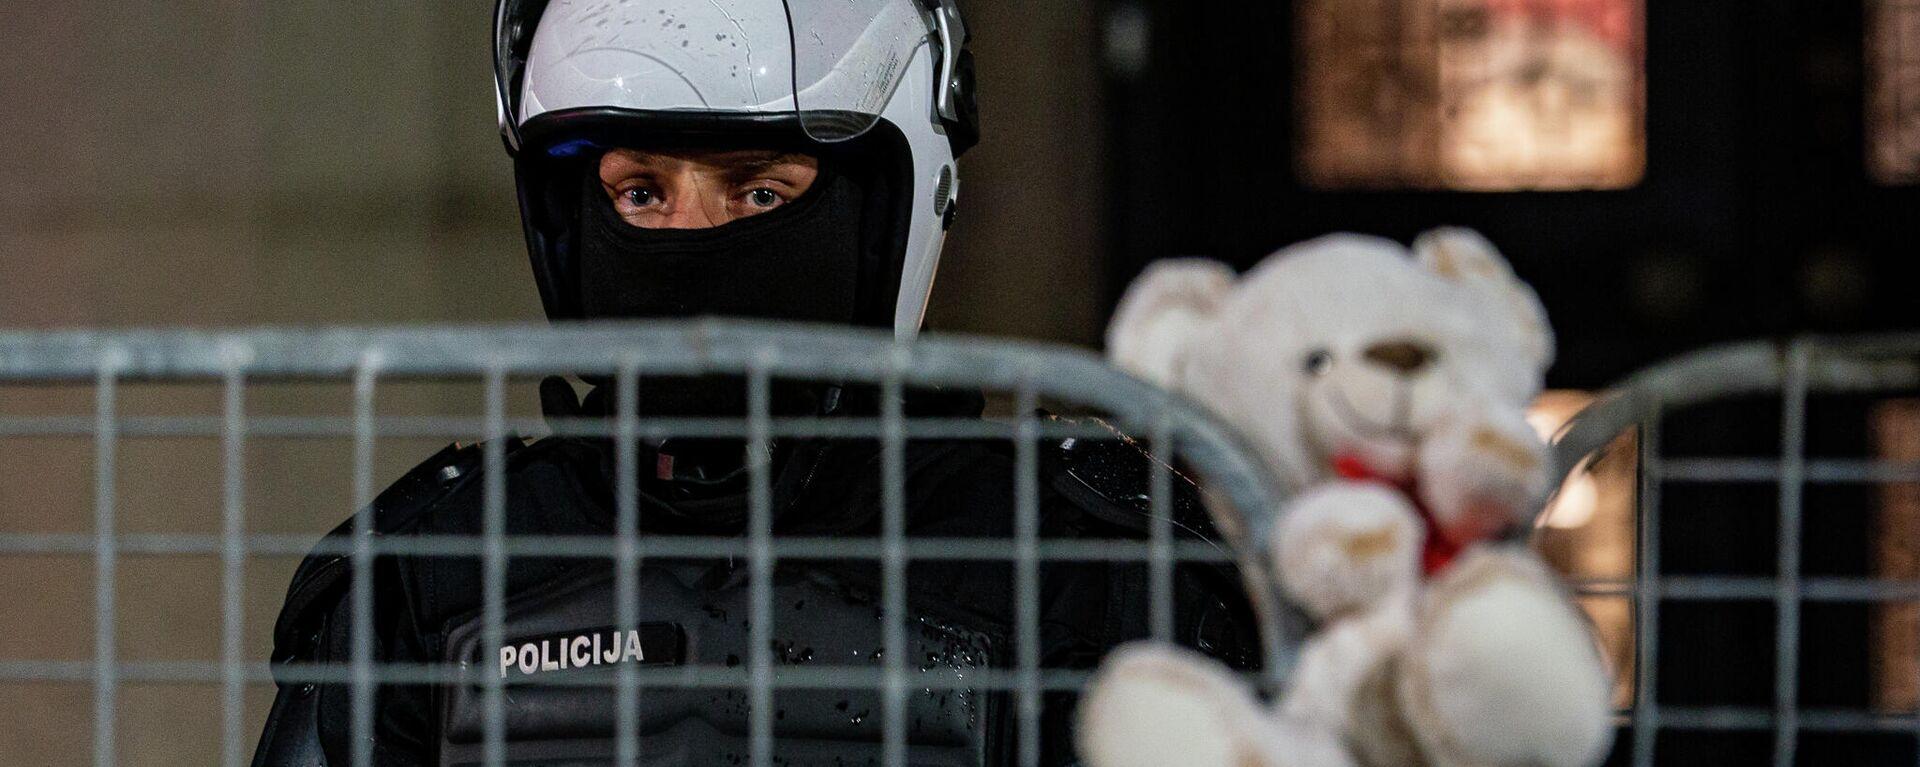 Акция протеста против обязательной вакцинации в Риге, 18 августа - Sputnik Латвия, 1920, 28.08.2021